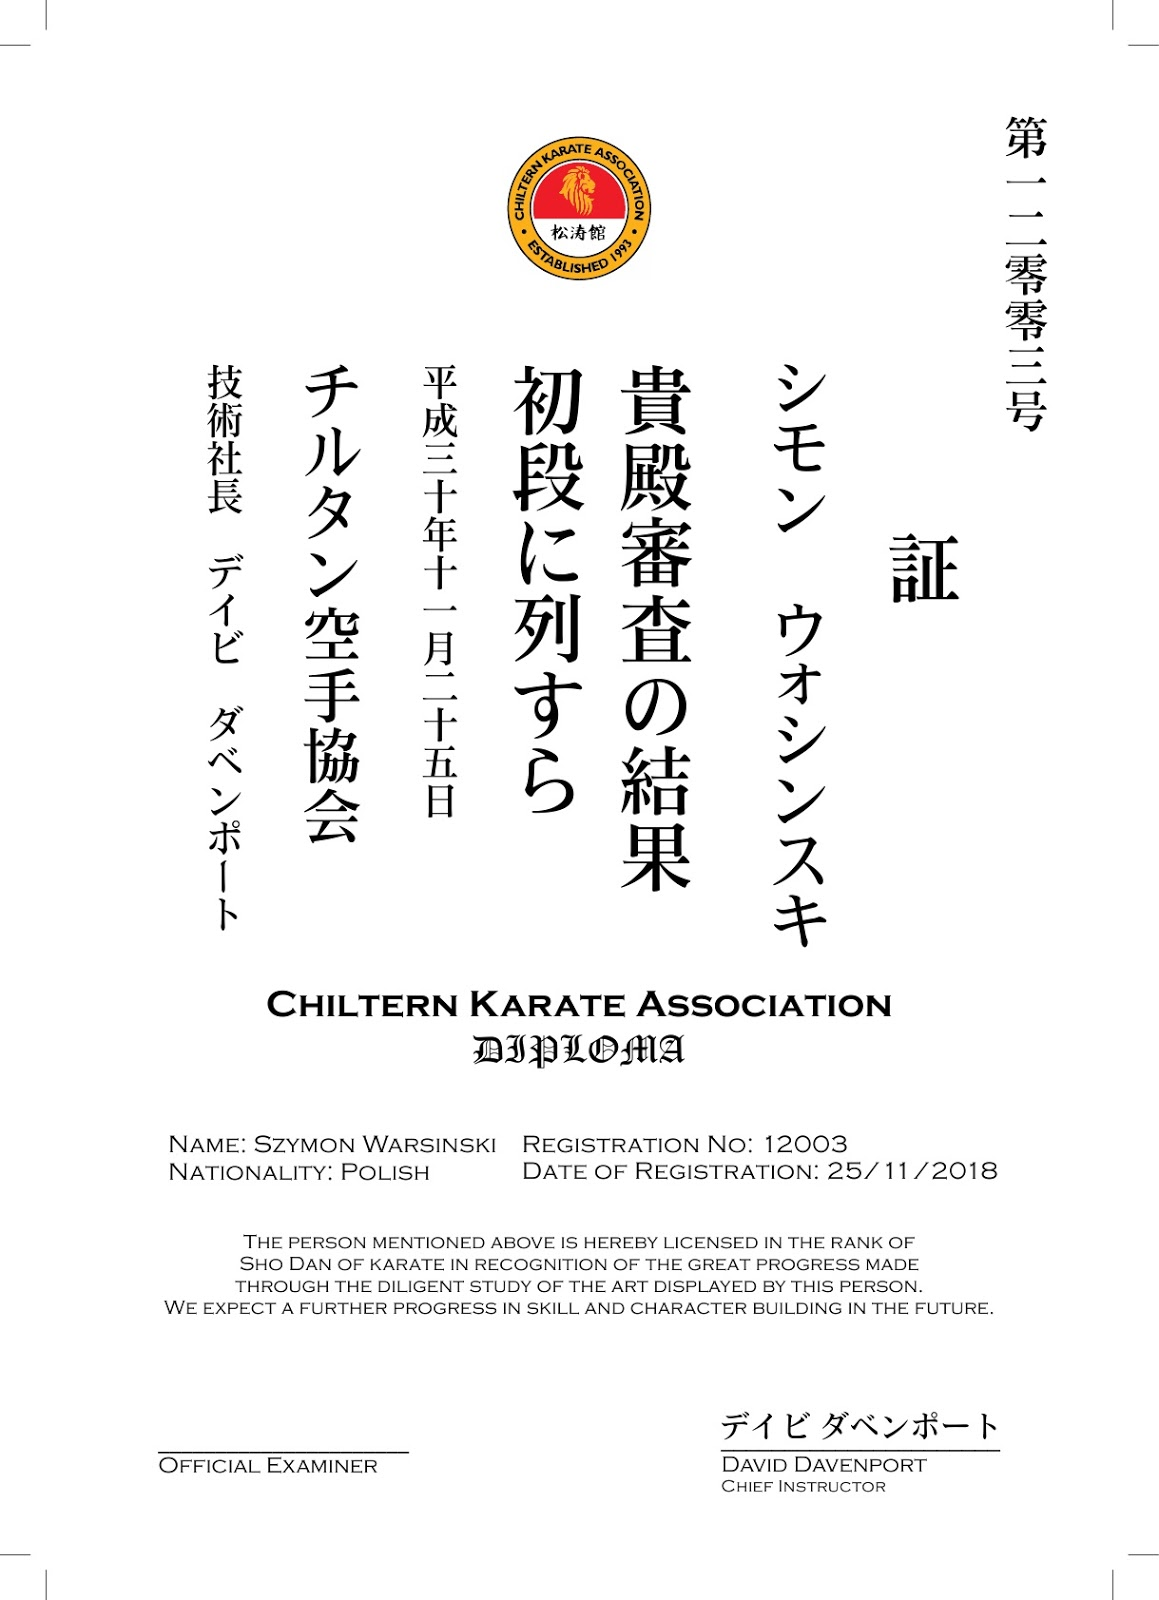 Nafuda Hanko And Inkan Custom A3 Dan Certificates For Chiltern